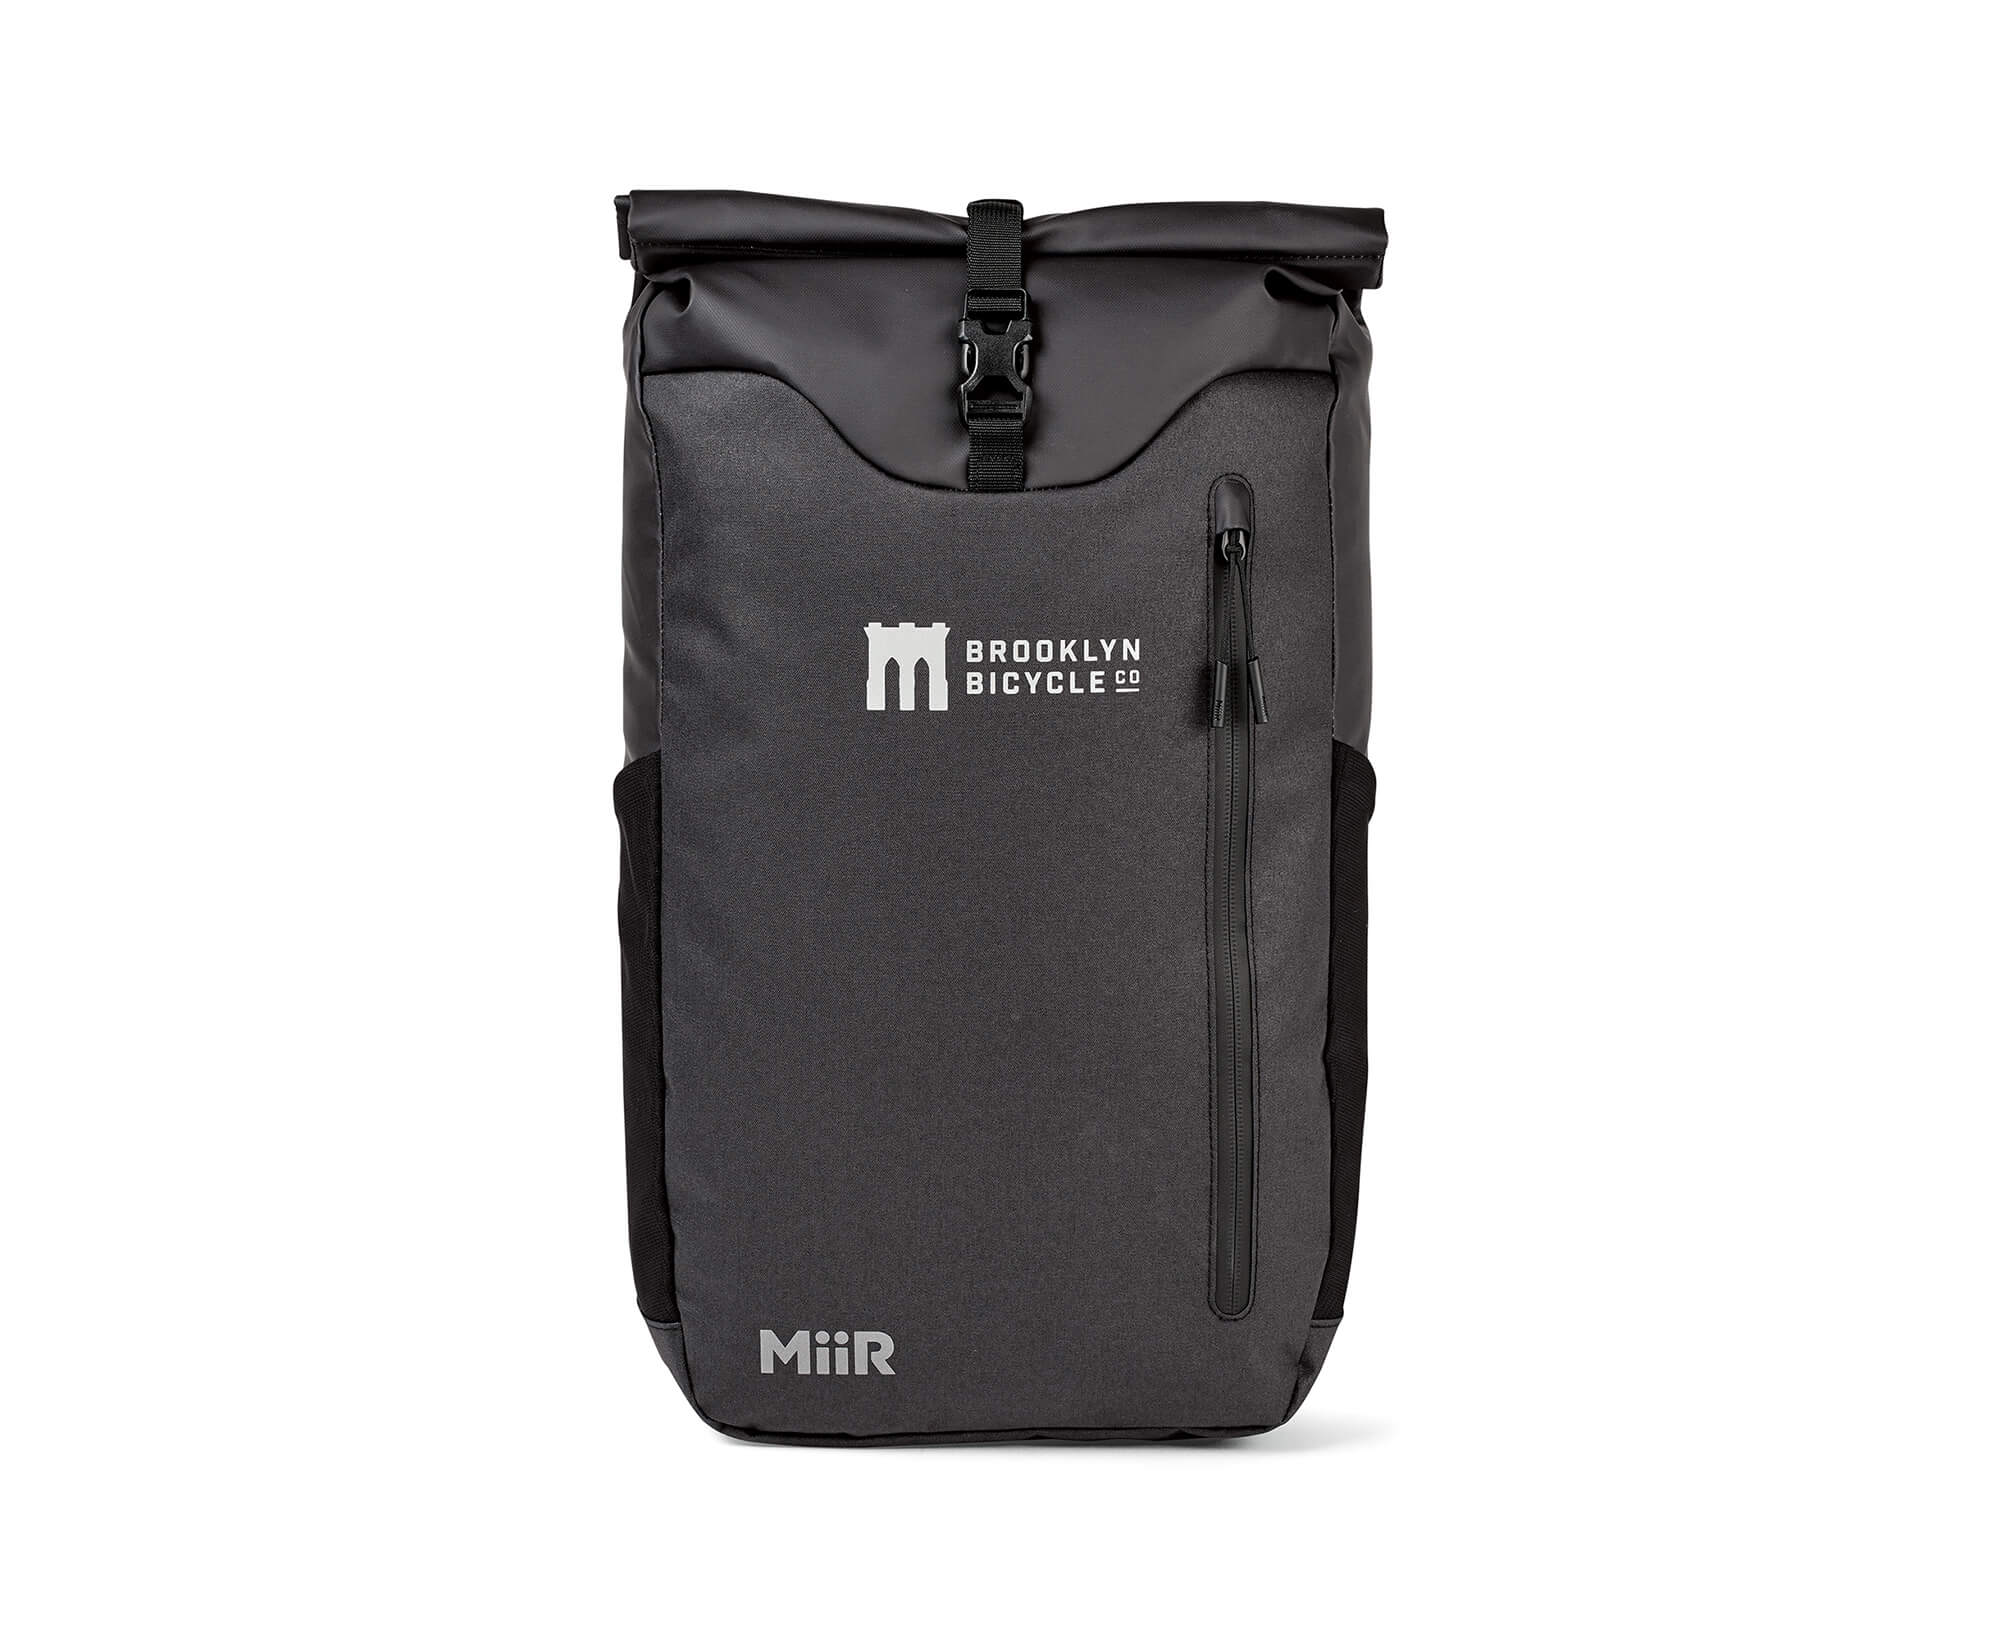 miir_front